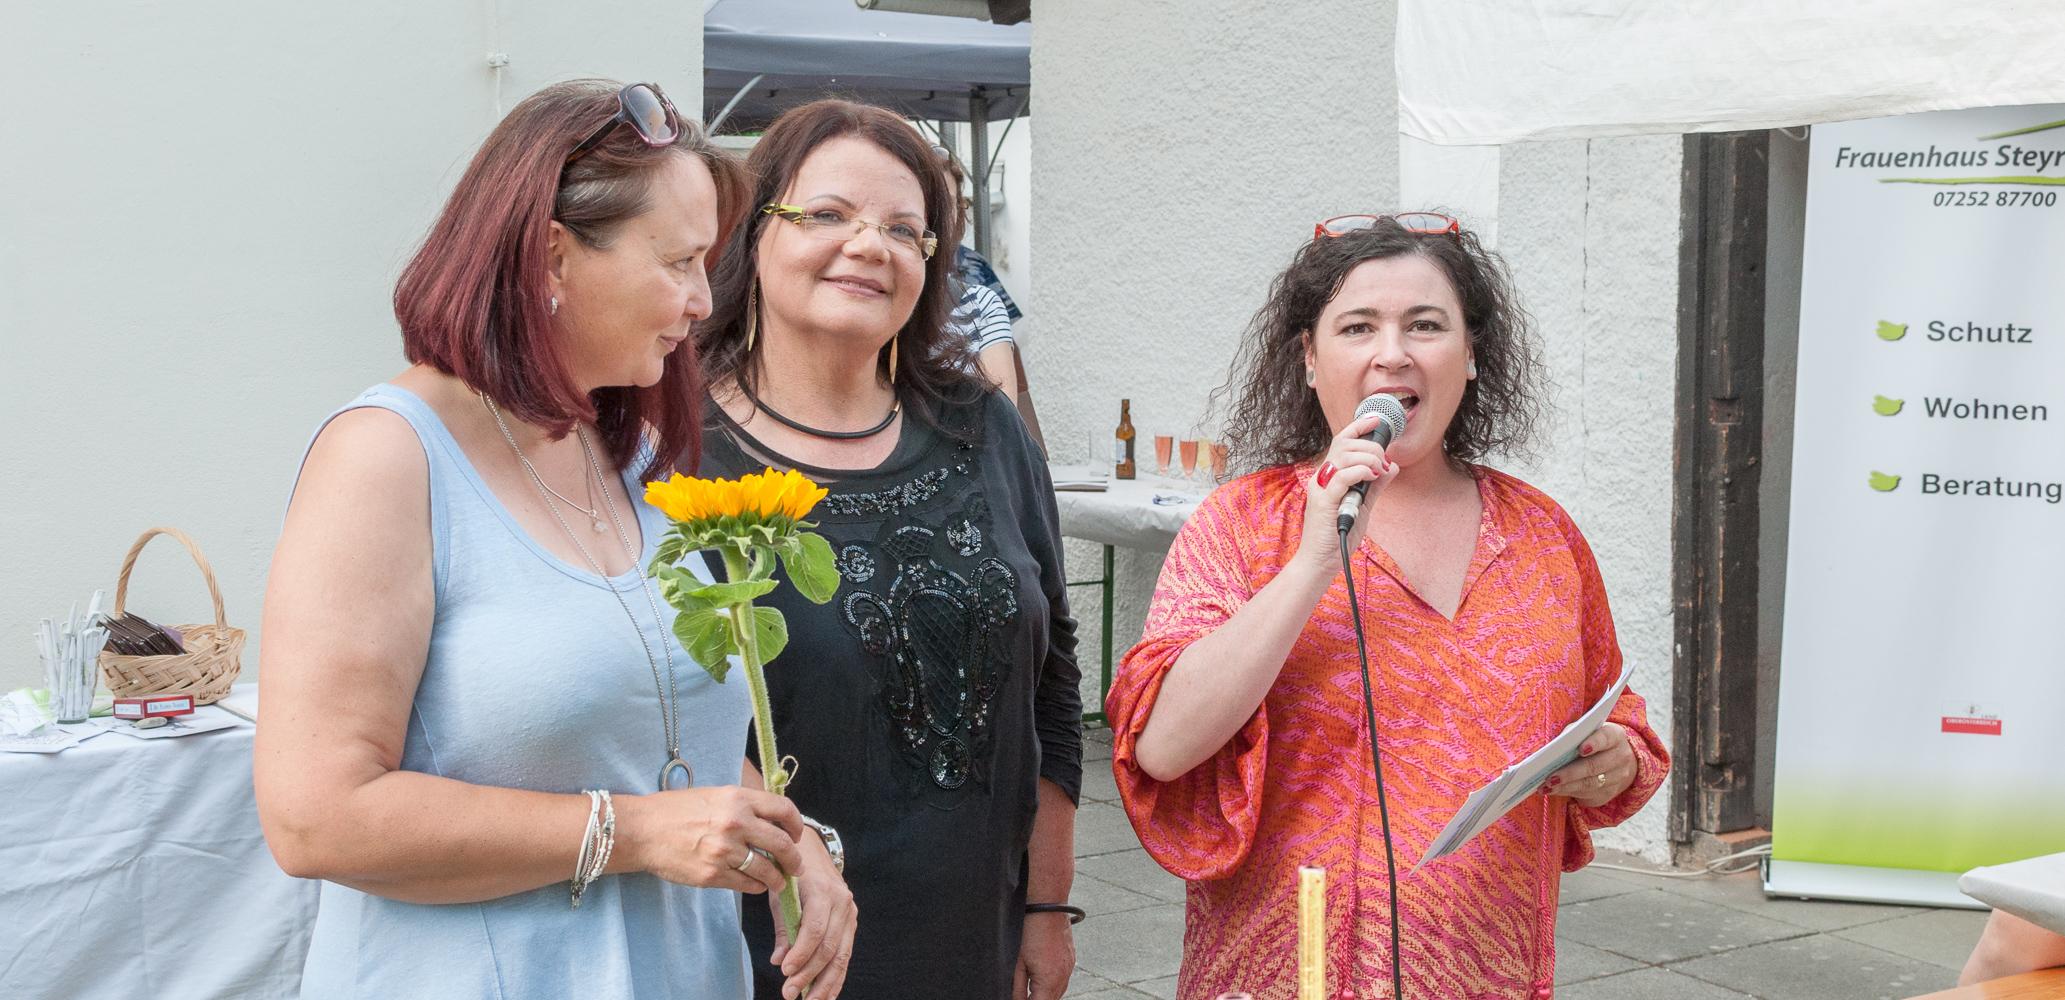 Frauenhaus Steyr Sommerfest